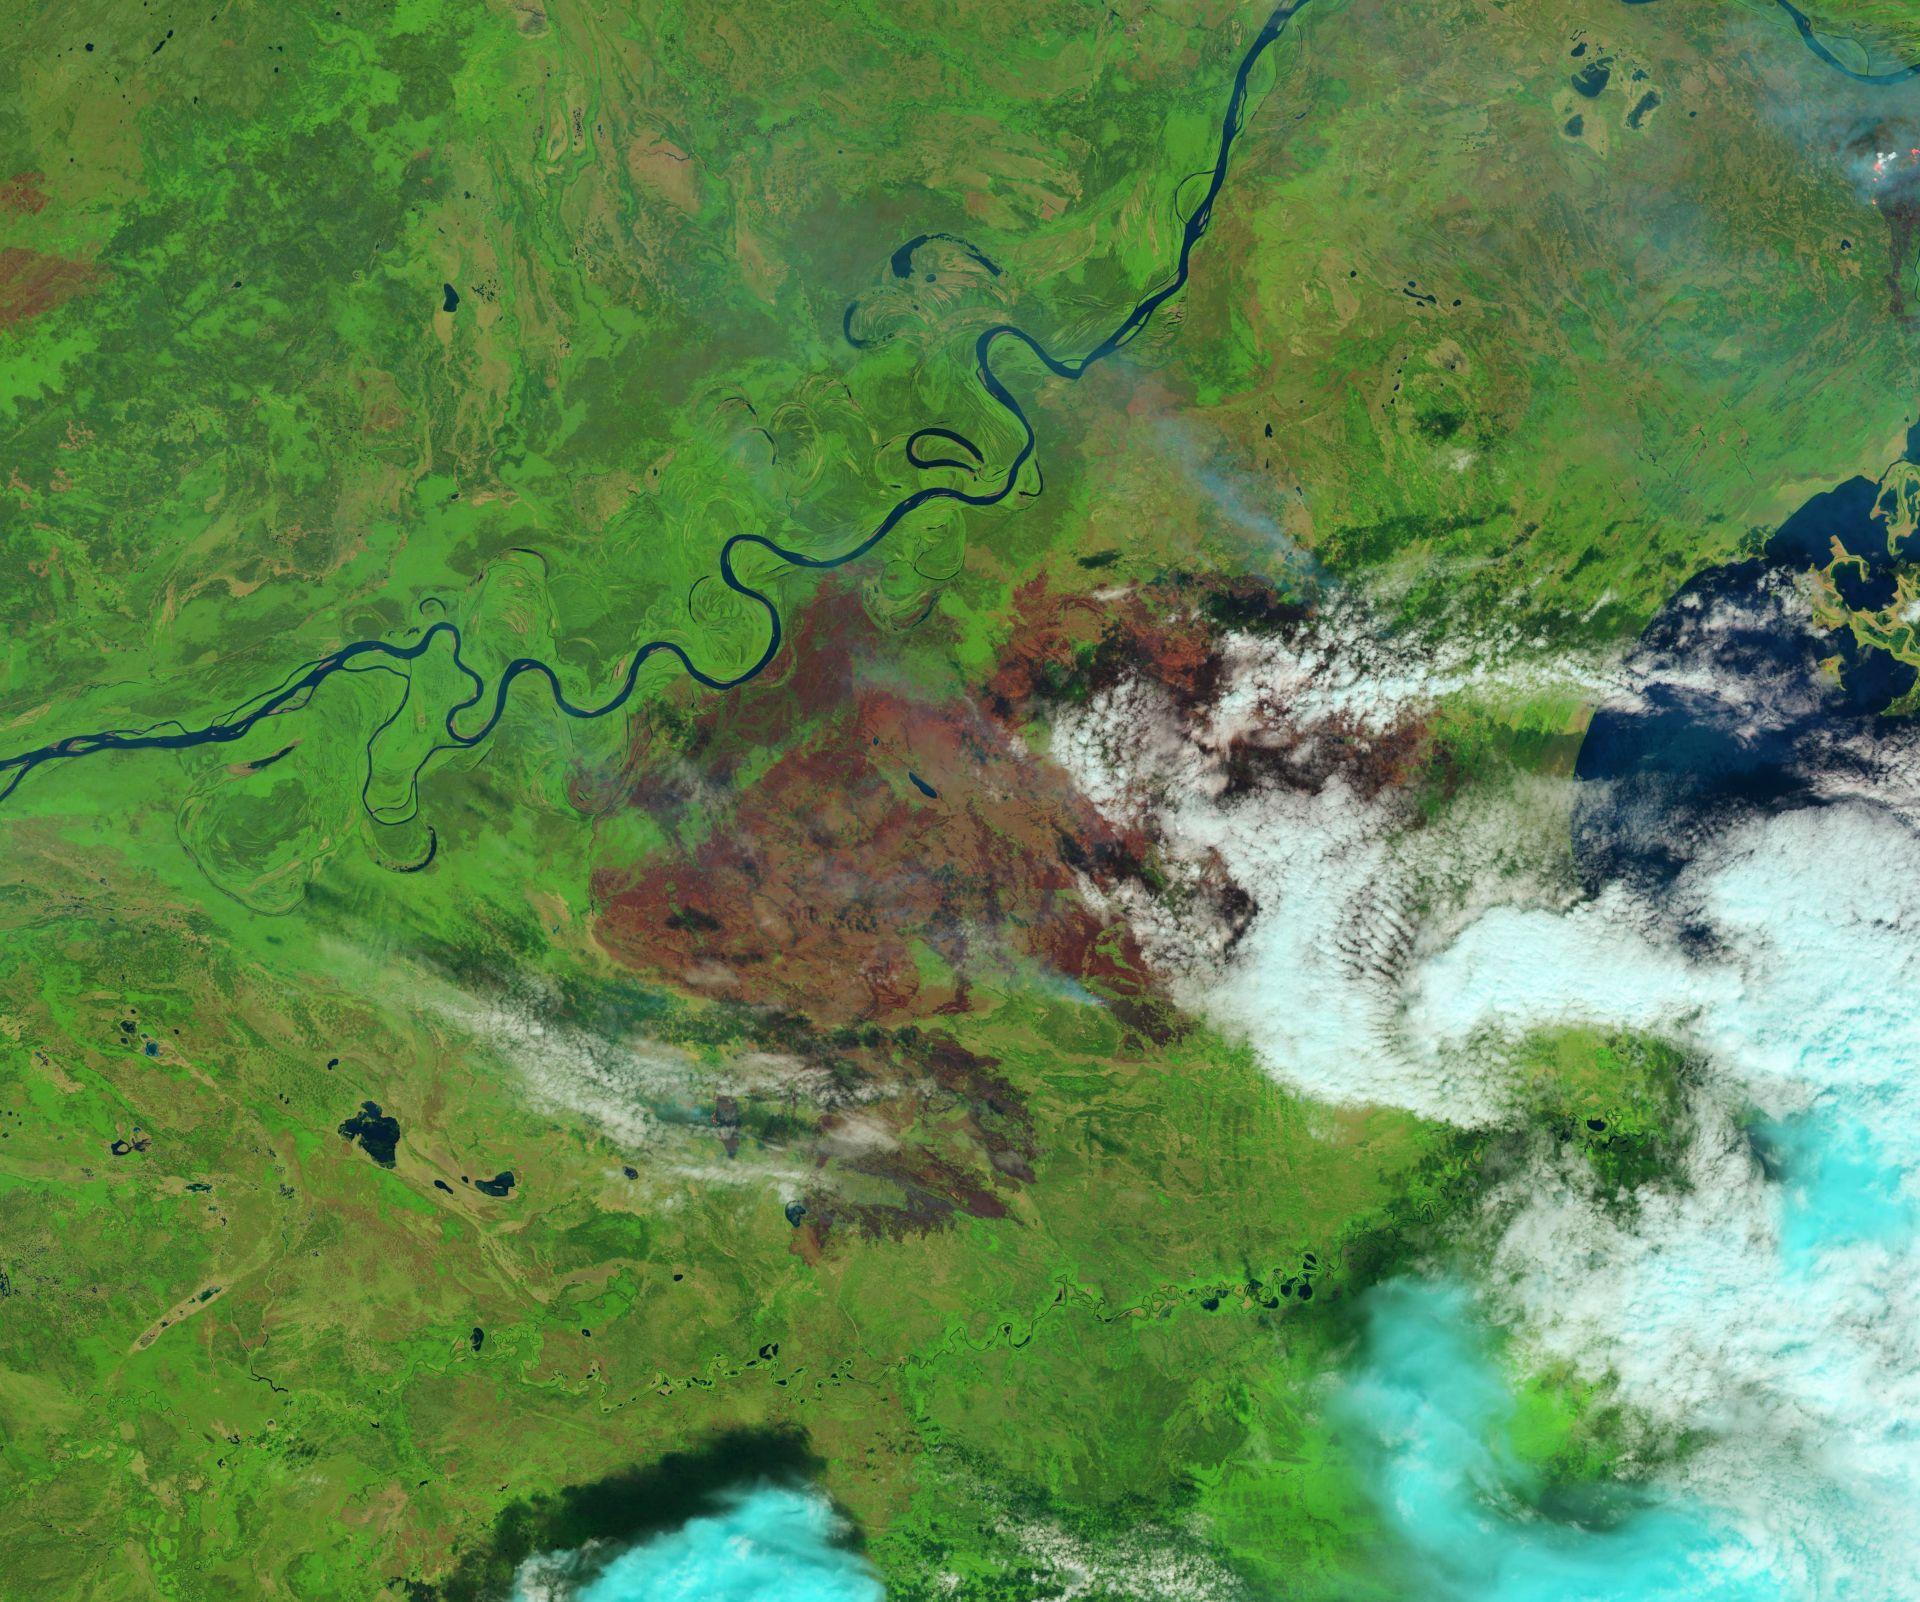 Incendies - Feux - Fire - Canada - Alberta - Saskatchewan- Landsat 8 - OLI - satellites - 26 Juin 2015 - USGS